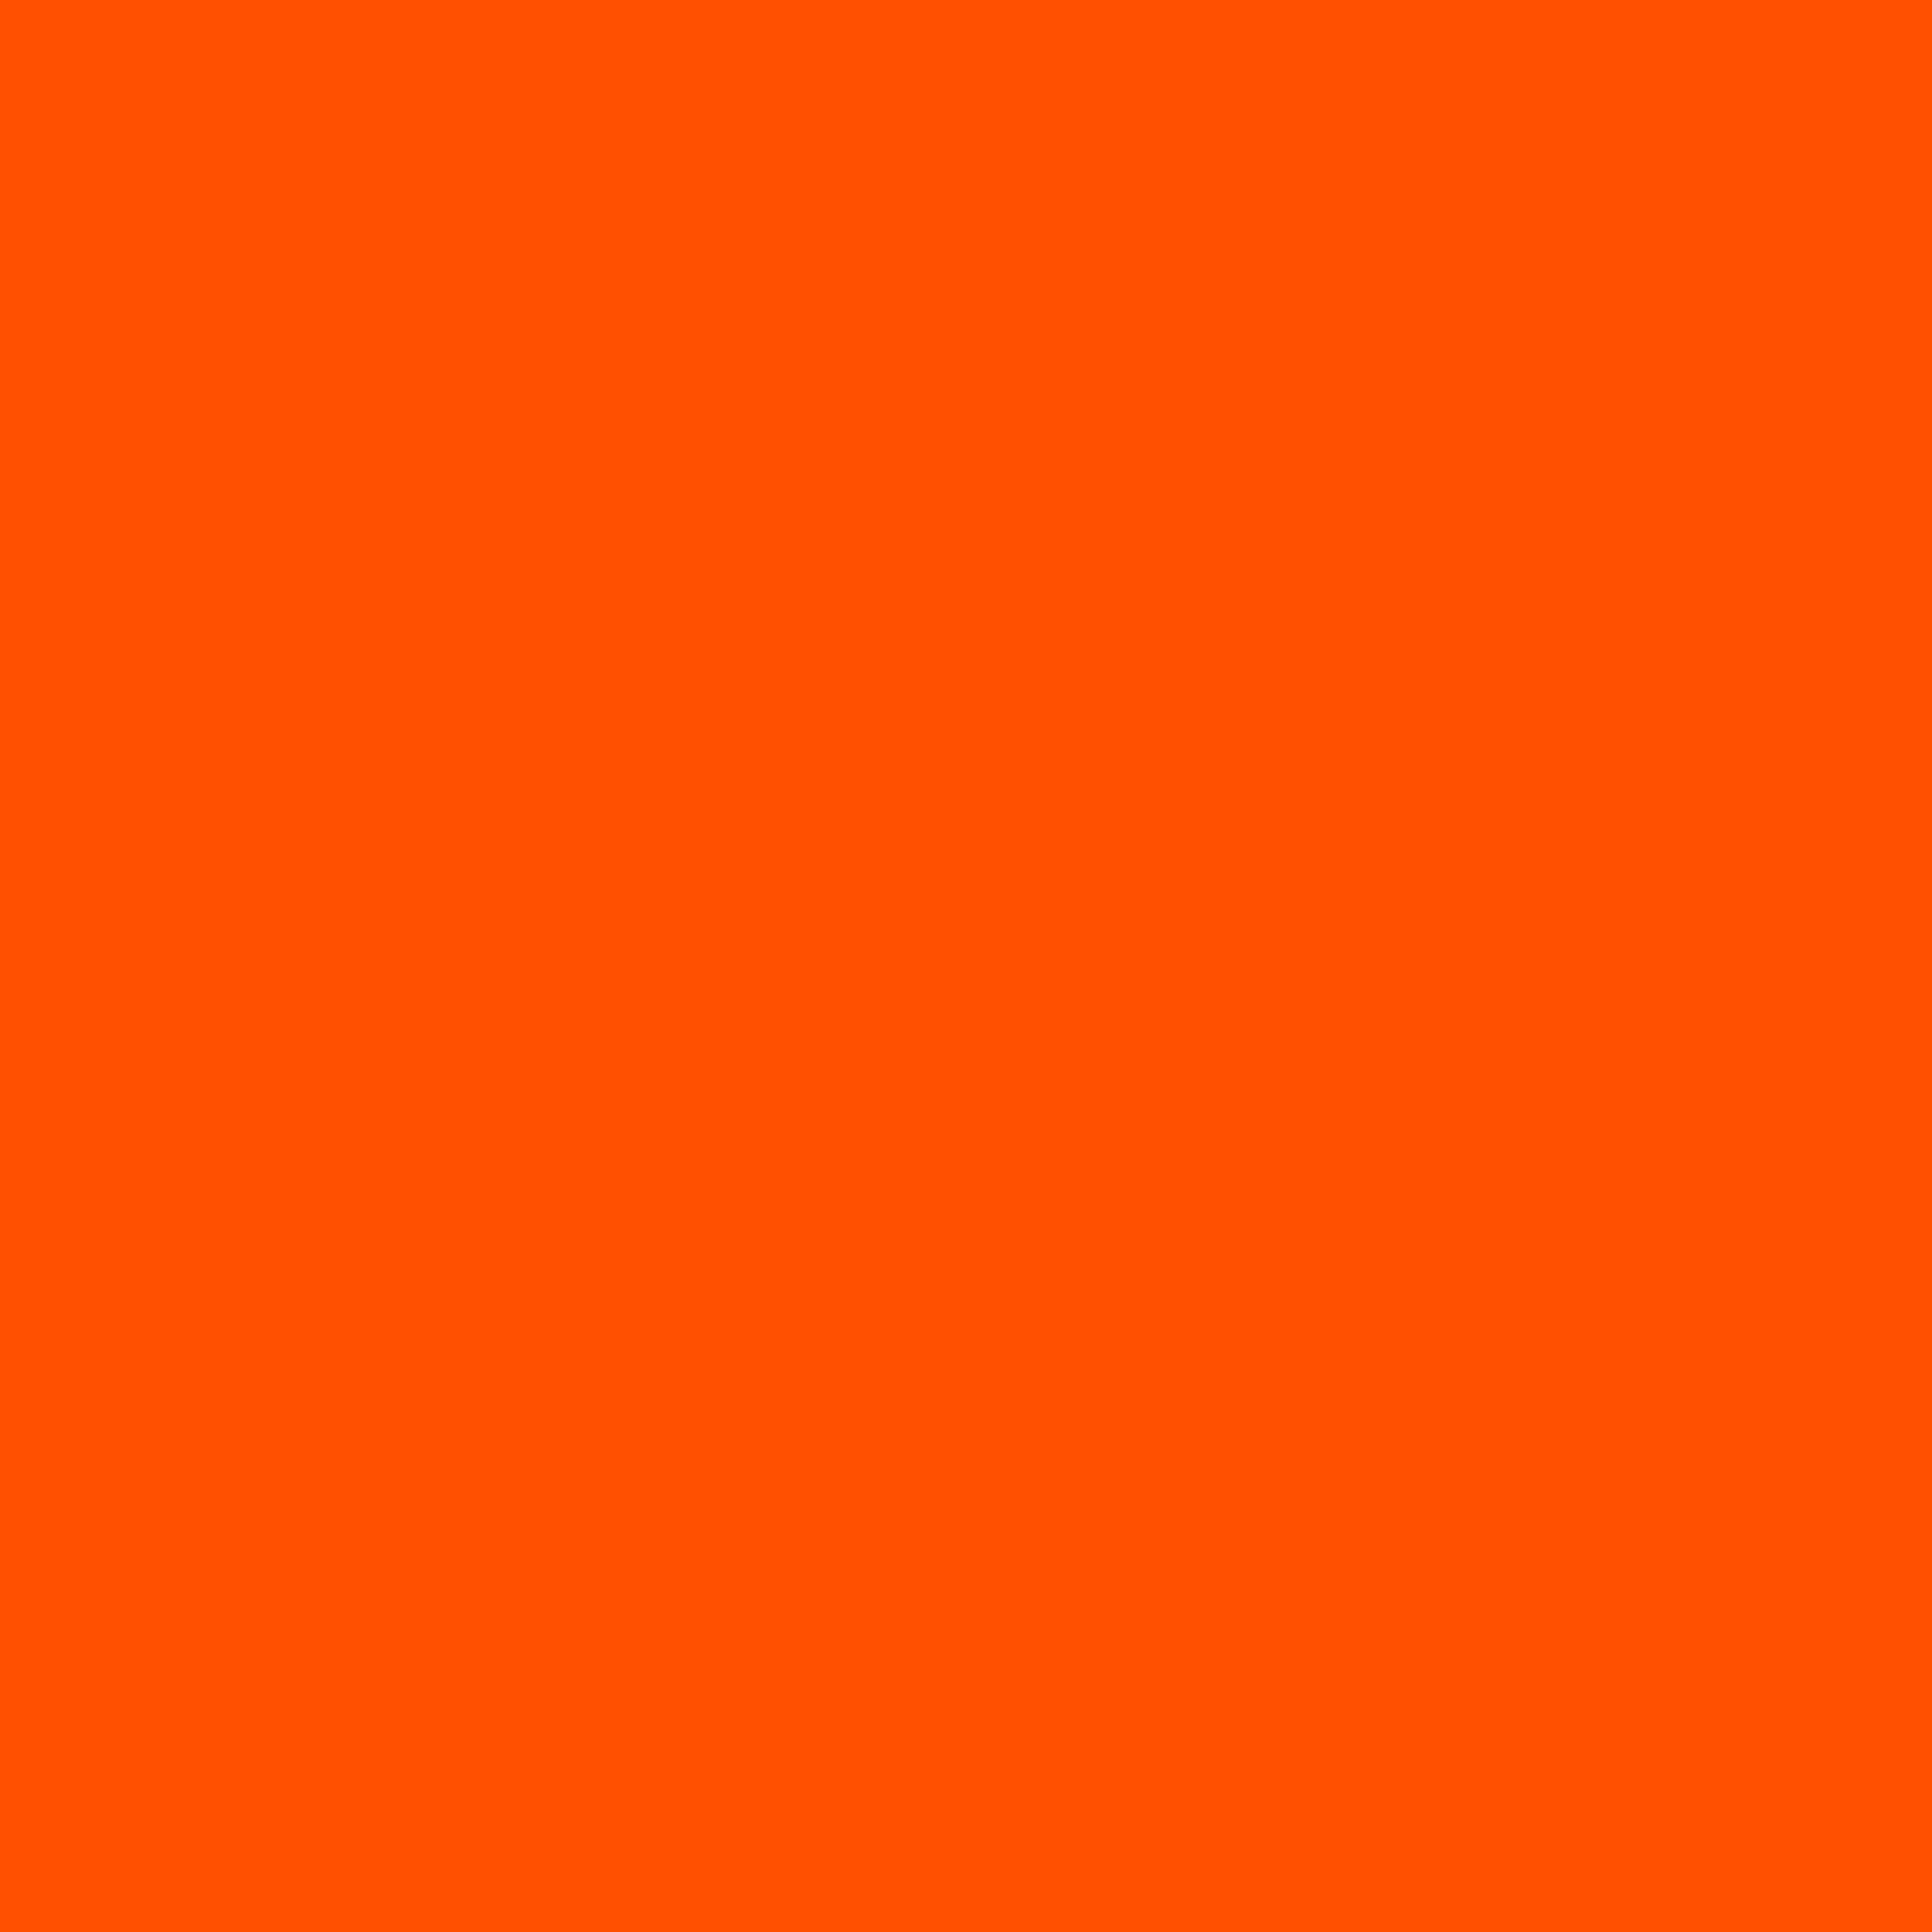 2732x2732 International Orange Aerospace Solid Color Background